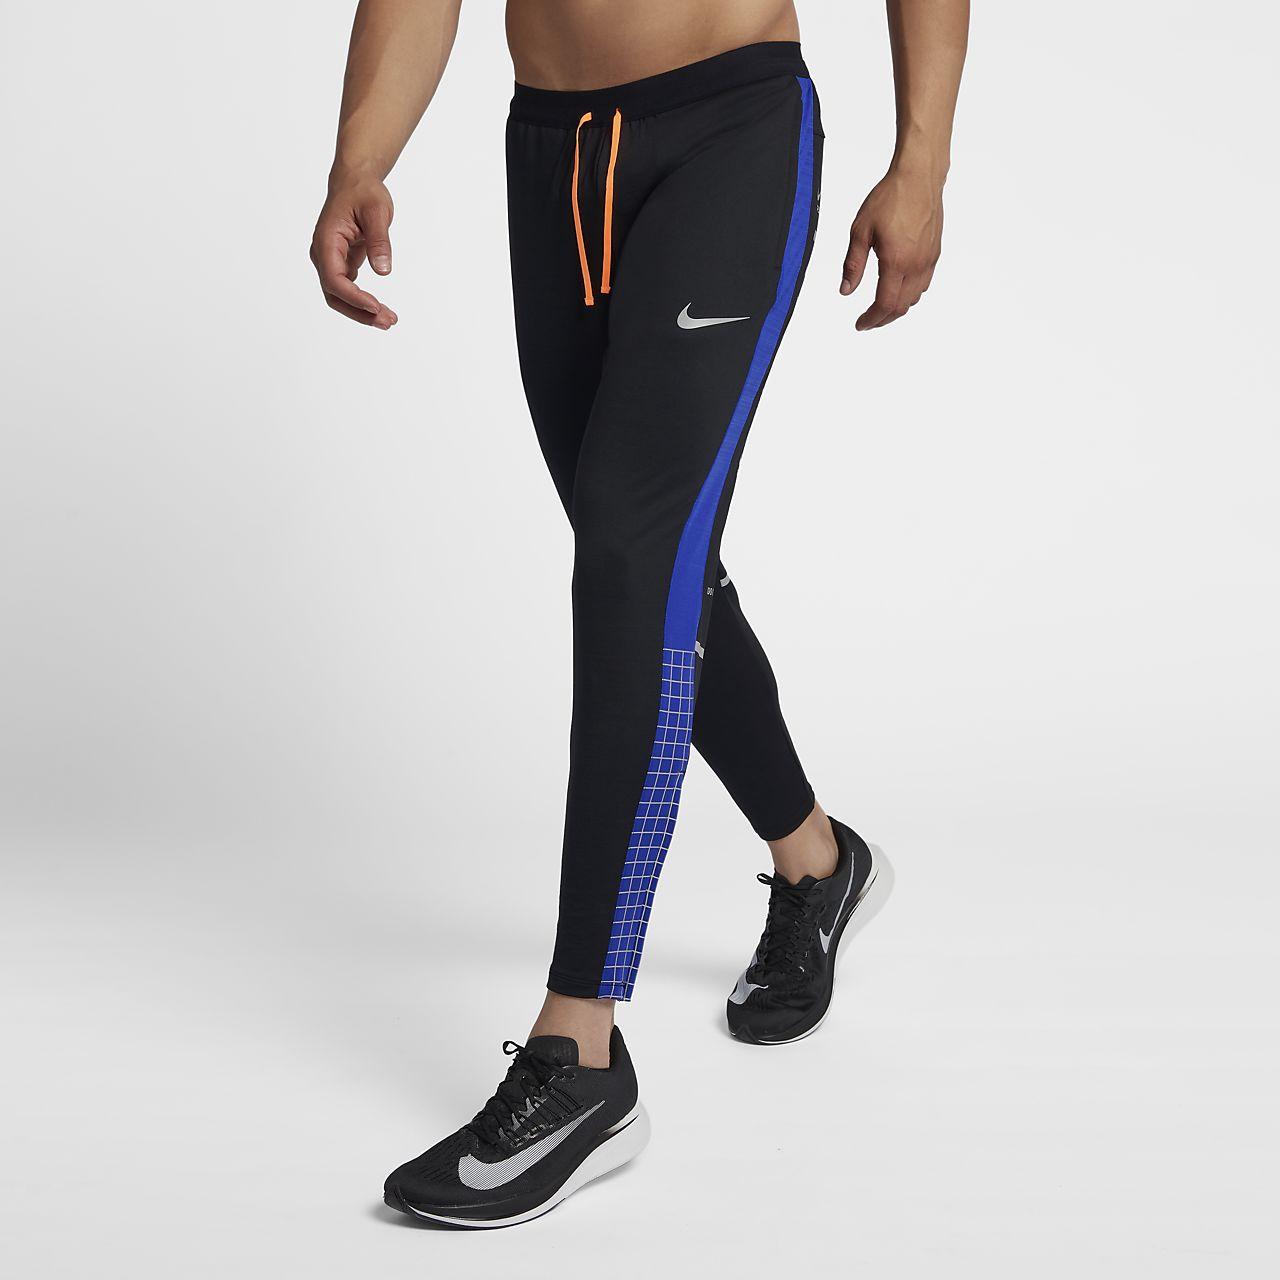 378512f8f977ac Nike Phenom Herren-Laufhose. Nike.com DE